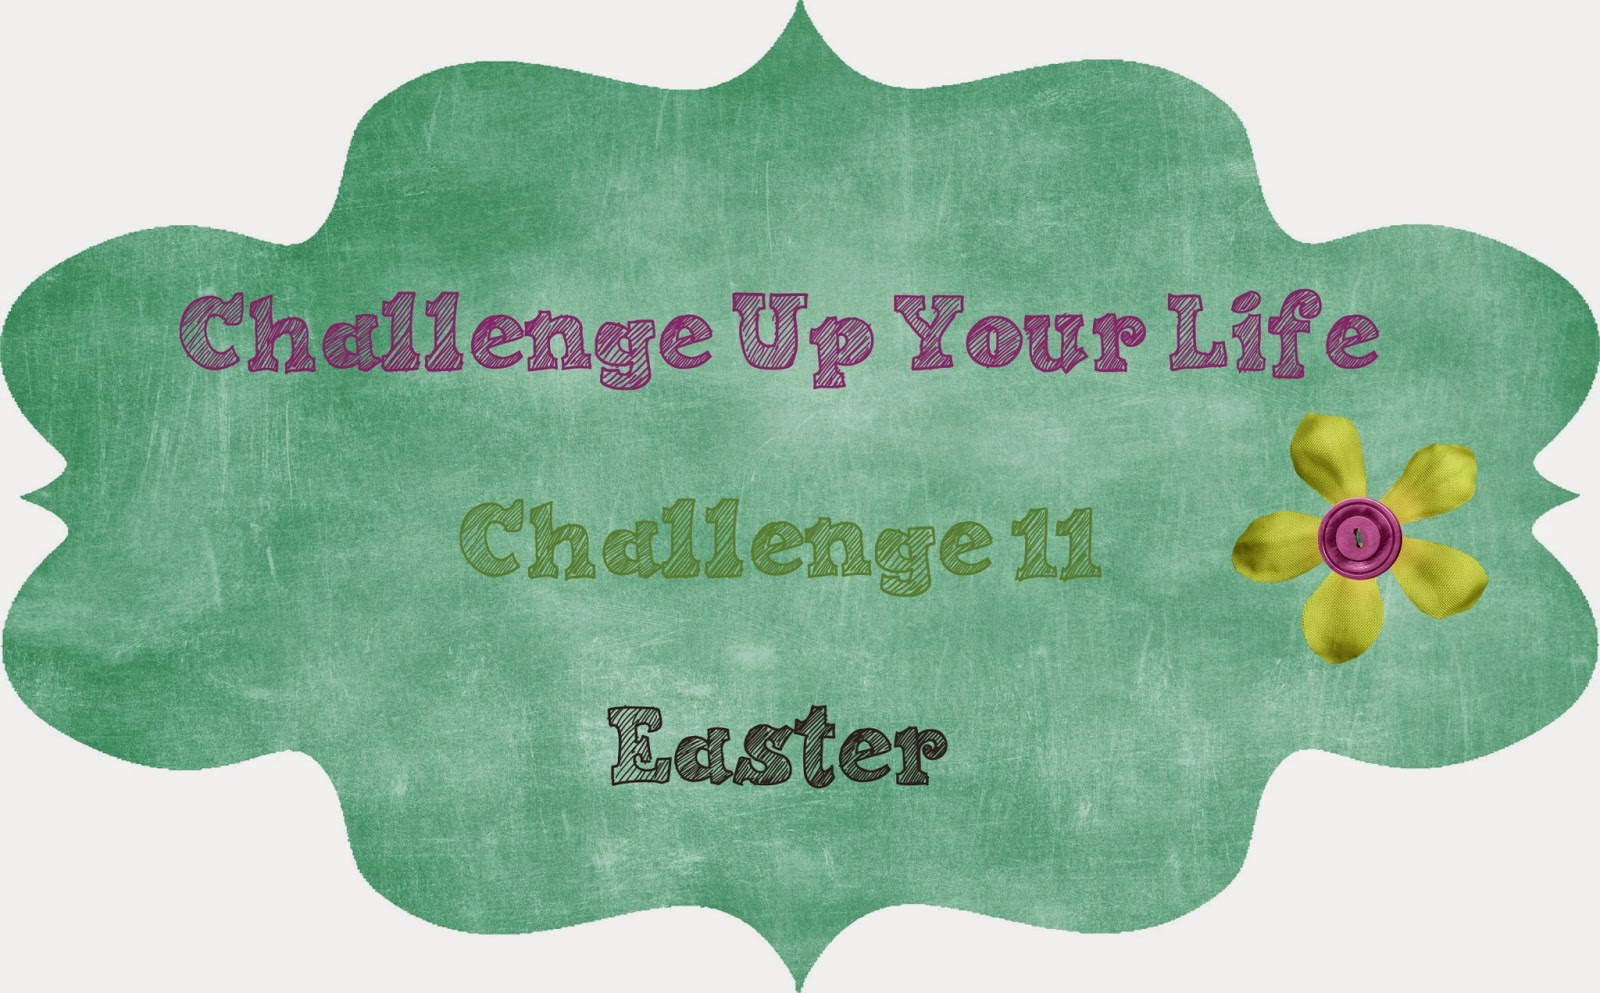 http://challengeupyourlife.blogspot.com/2015/03/challenge-11-easter.html#.VRg2Mo5EN8E